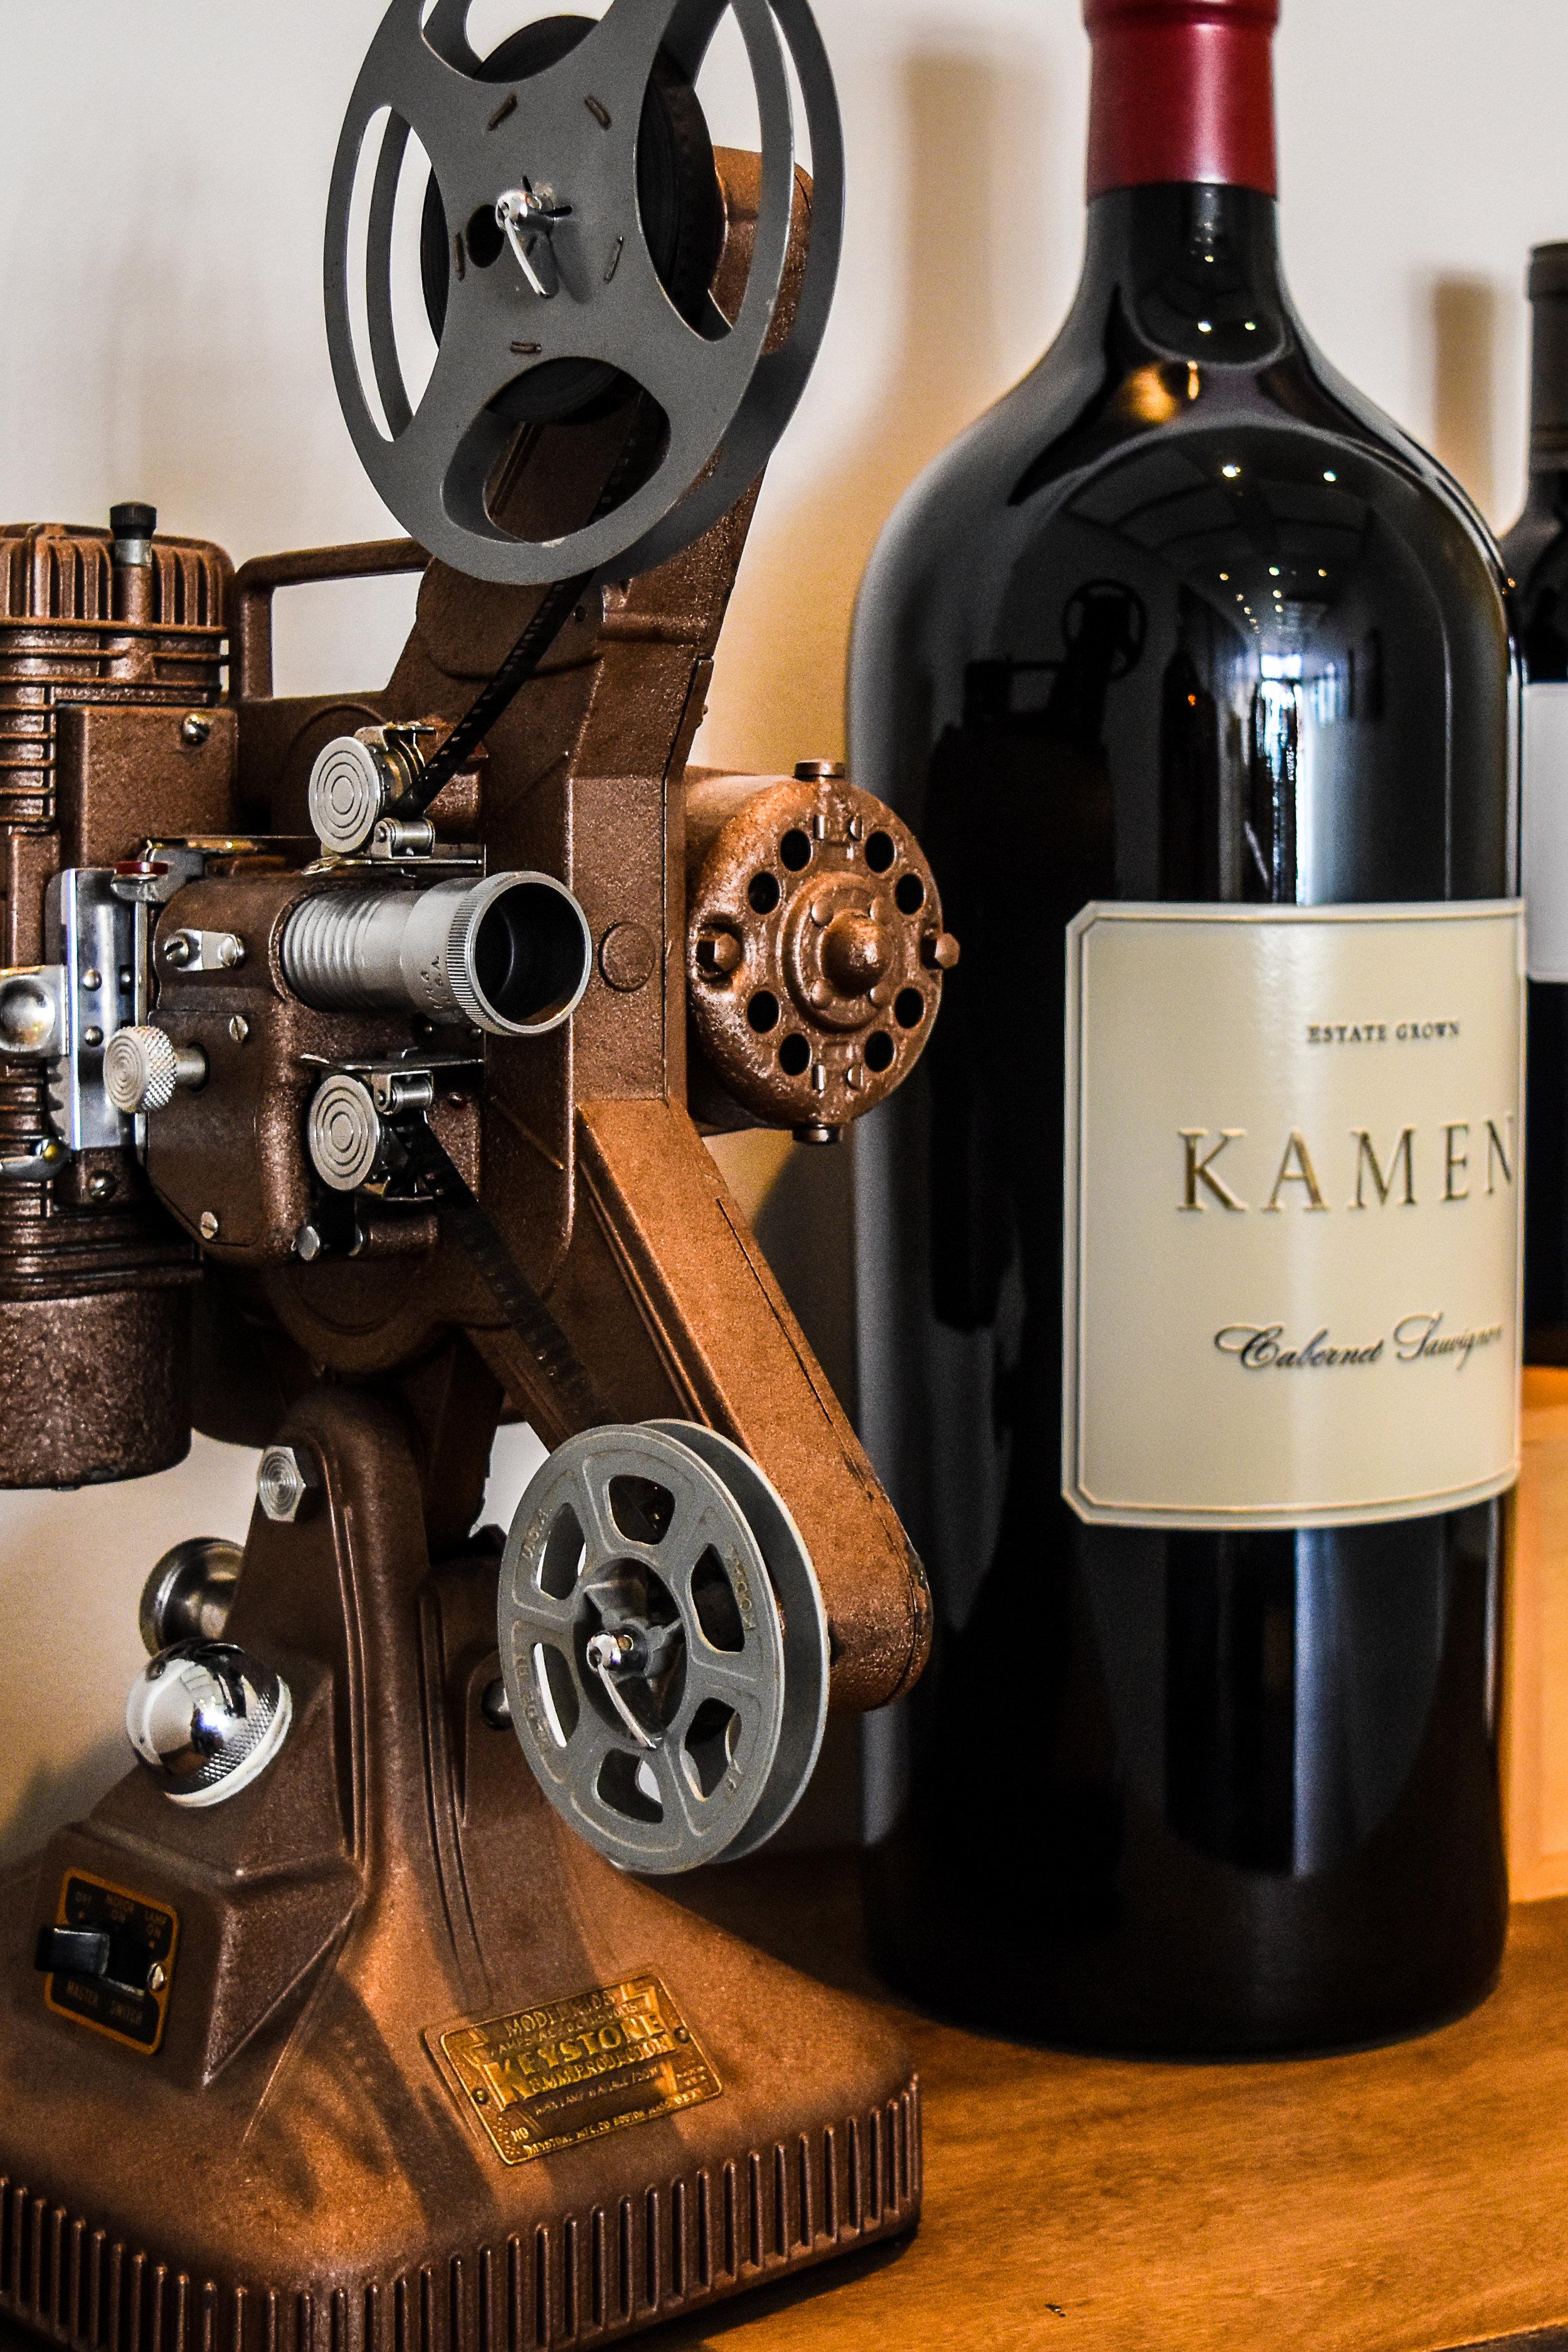 Kamen Estate Wines, Summer 2017 (Sonoma)